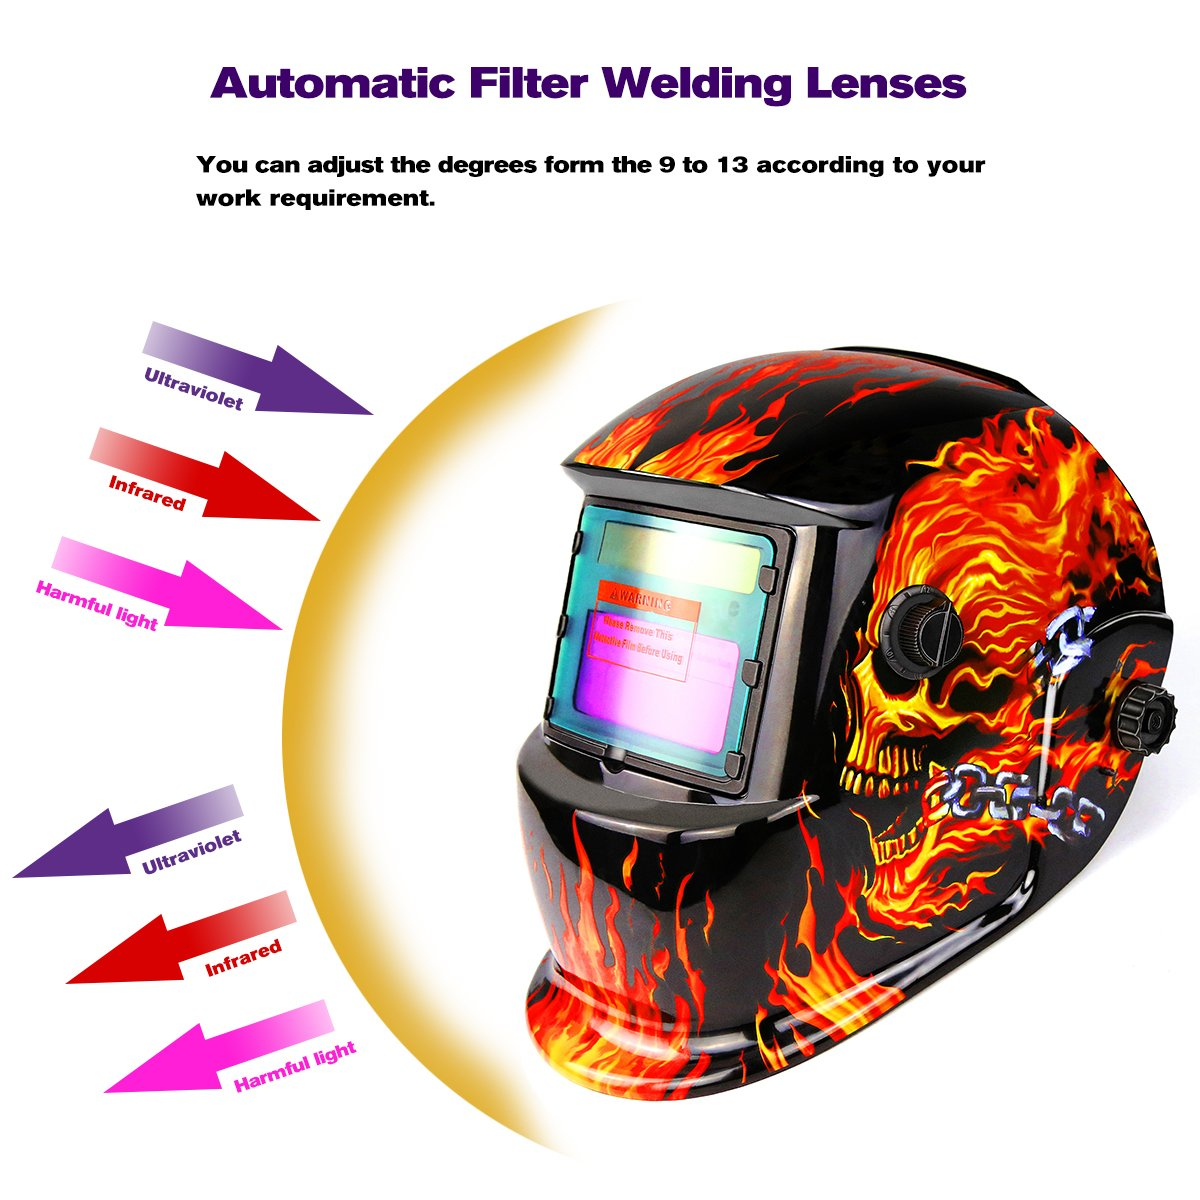 Solar Powered Welding Helmet Auto Darkening Professional Hood with Wide Lens Adjustable Shade Range by DEKOPRO (Image #7)